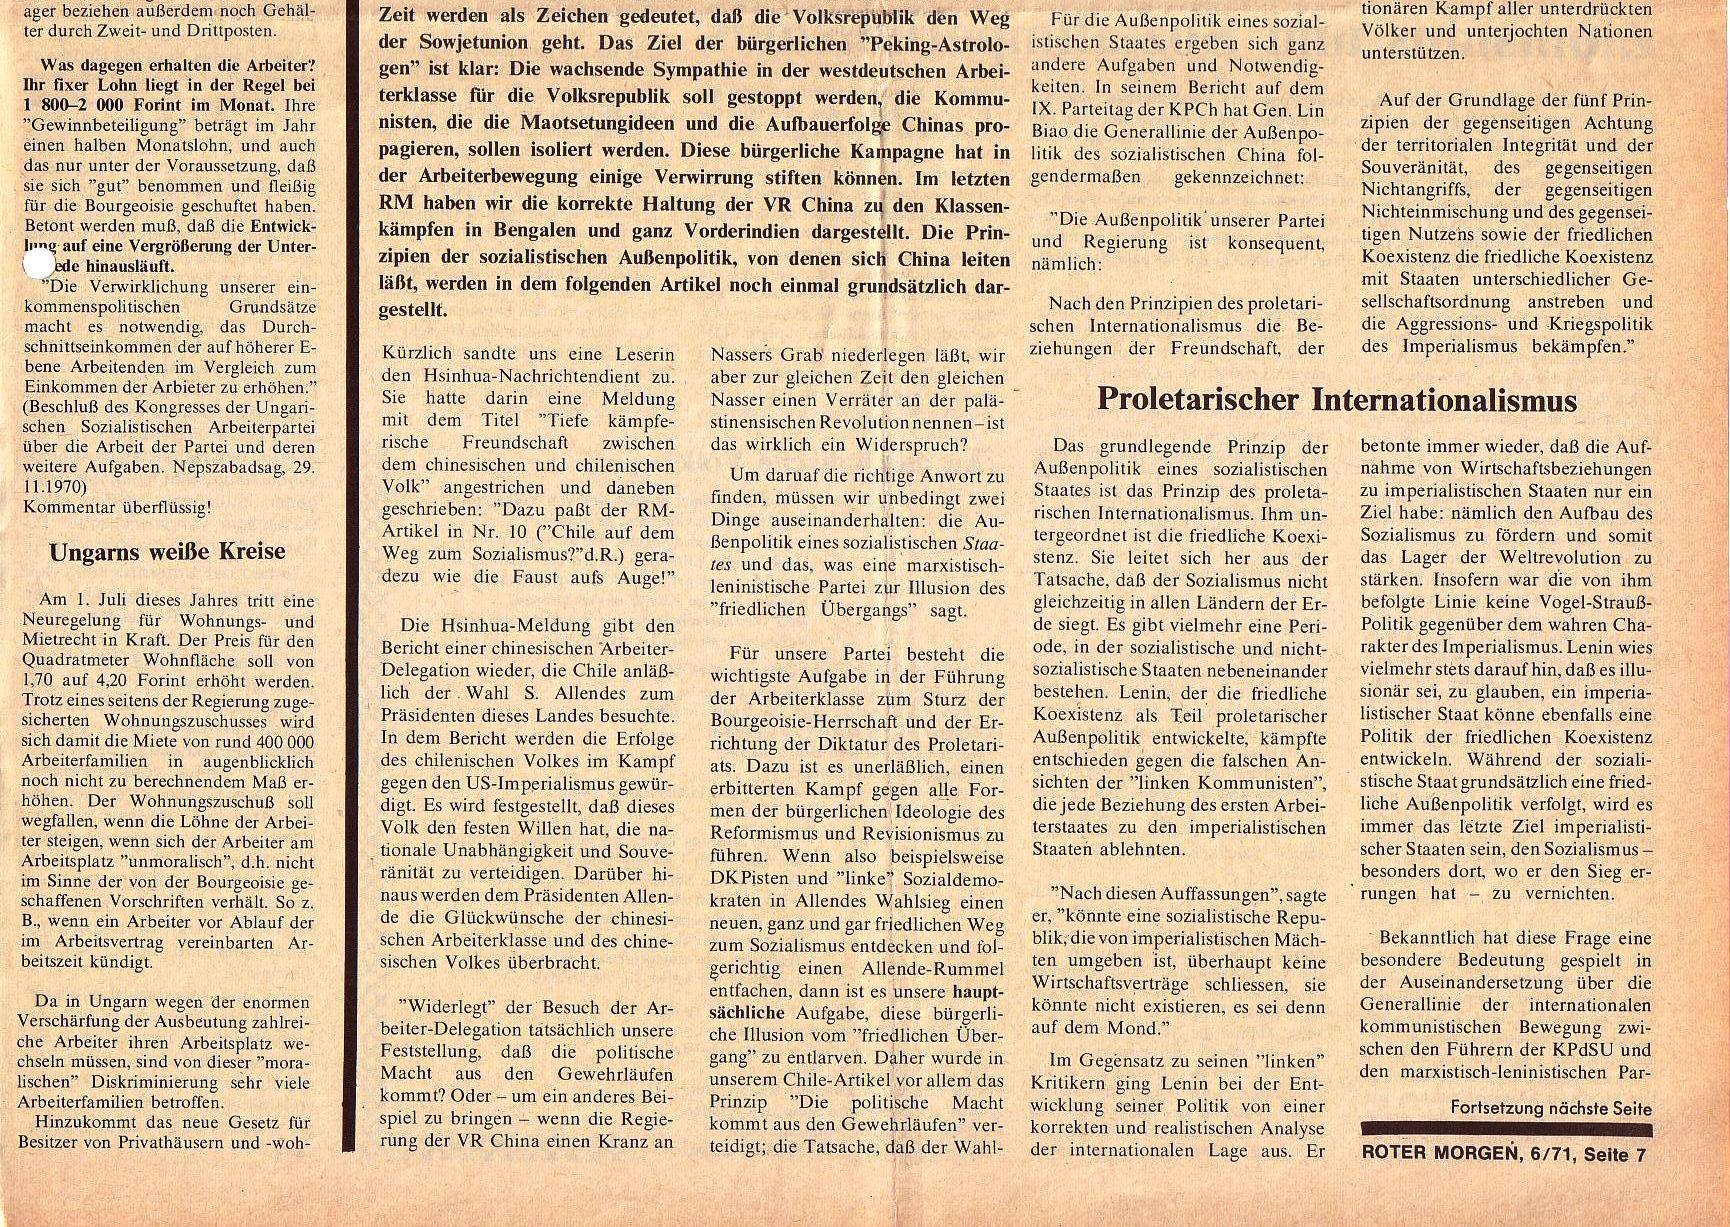 Roter Morgen, 5. Jg., Juni 1971, Nr. 6, Seite 7b